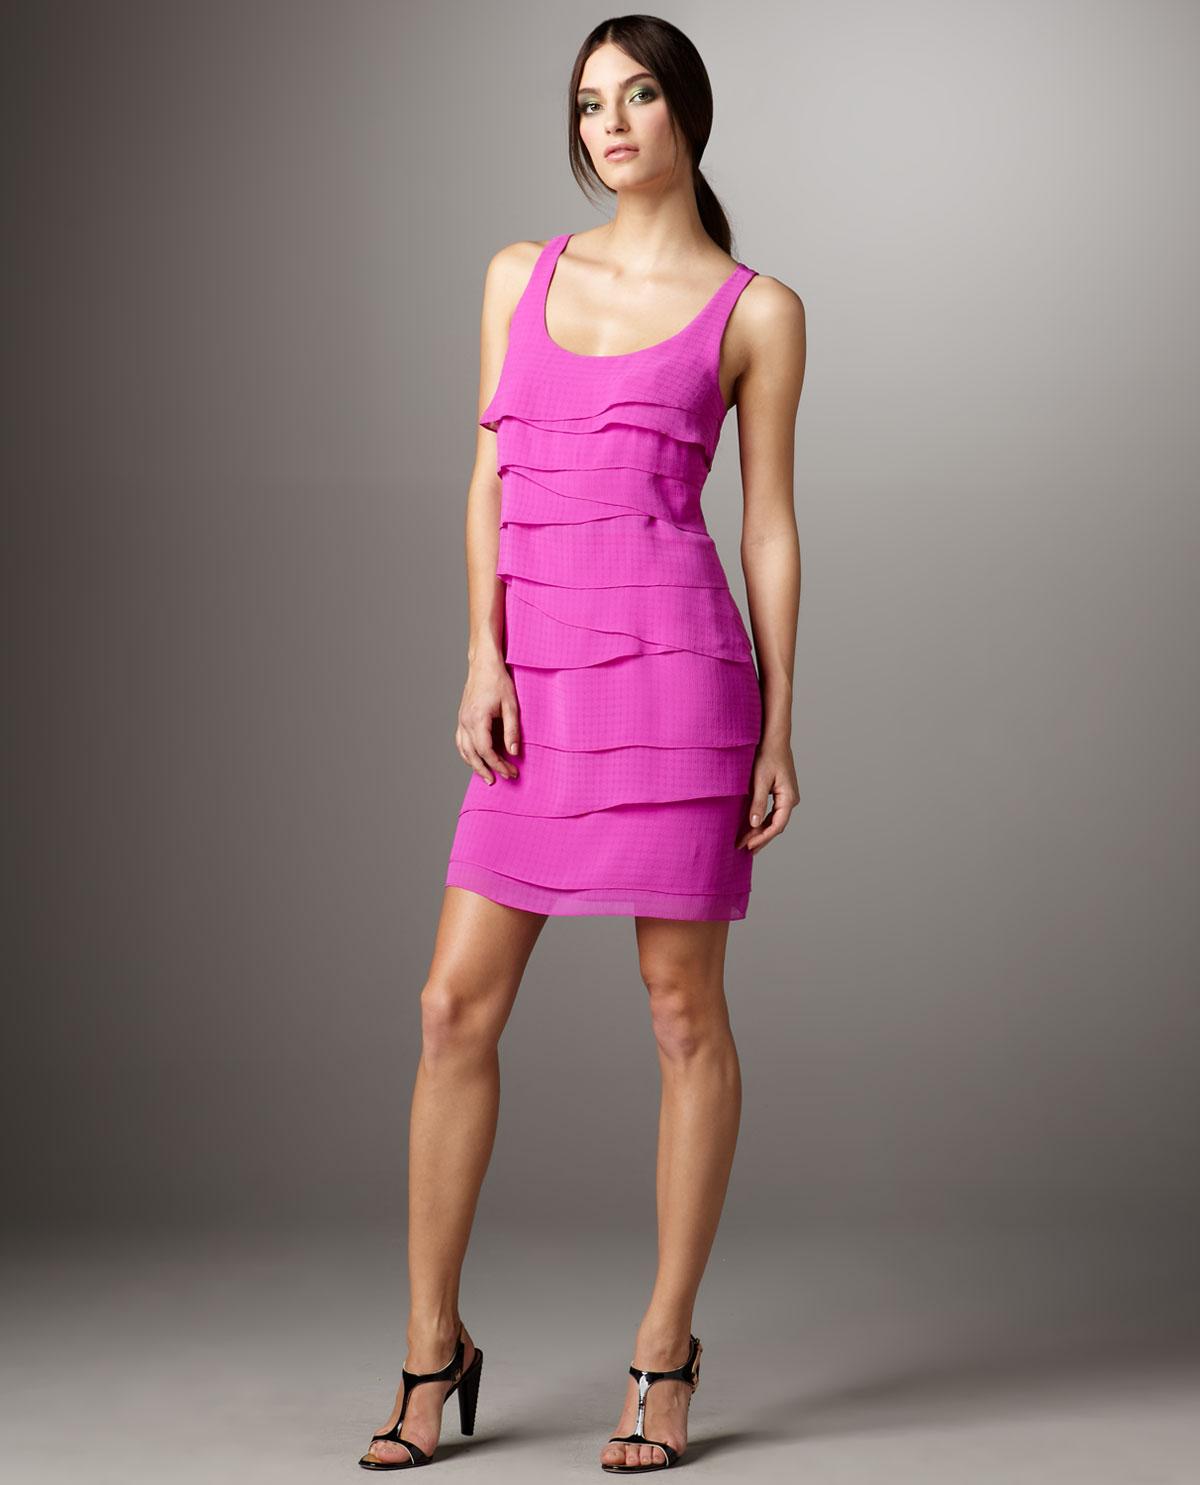 Shoshanna Sleeveless Tiered Dress in Pink - Lyst